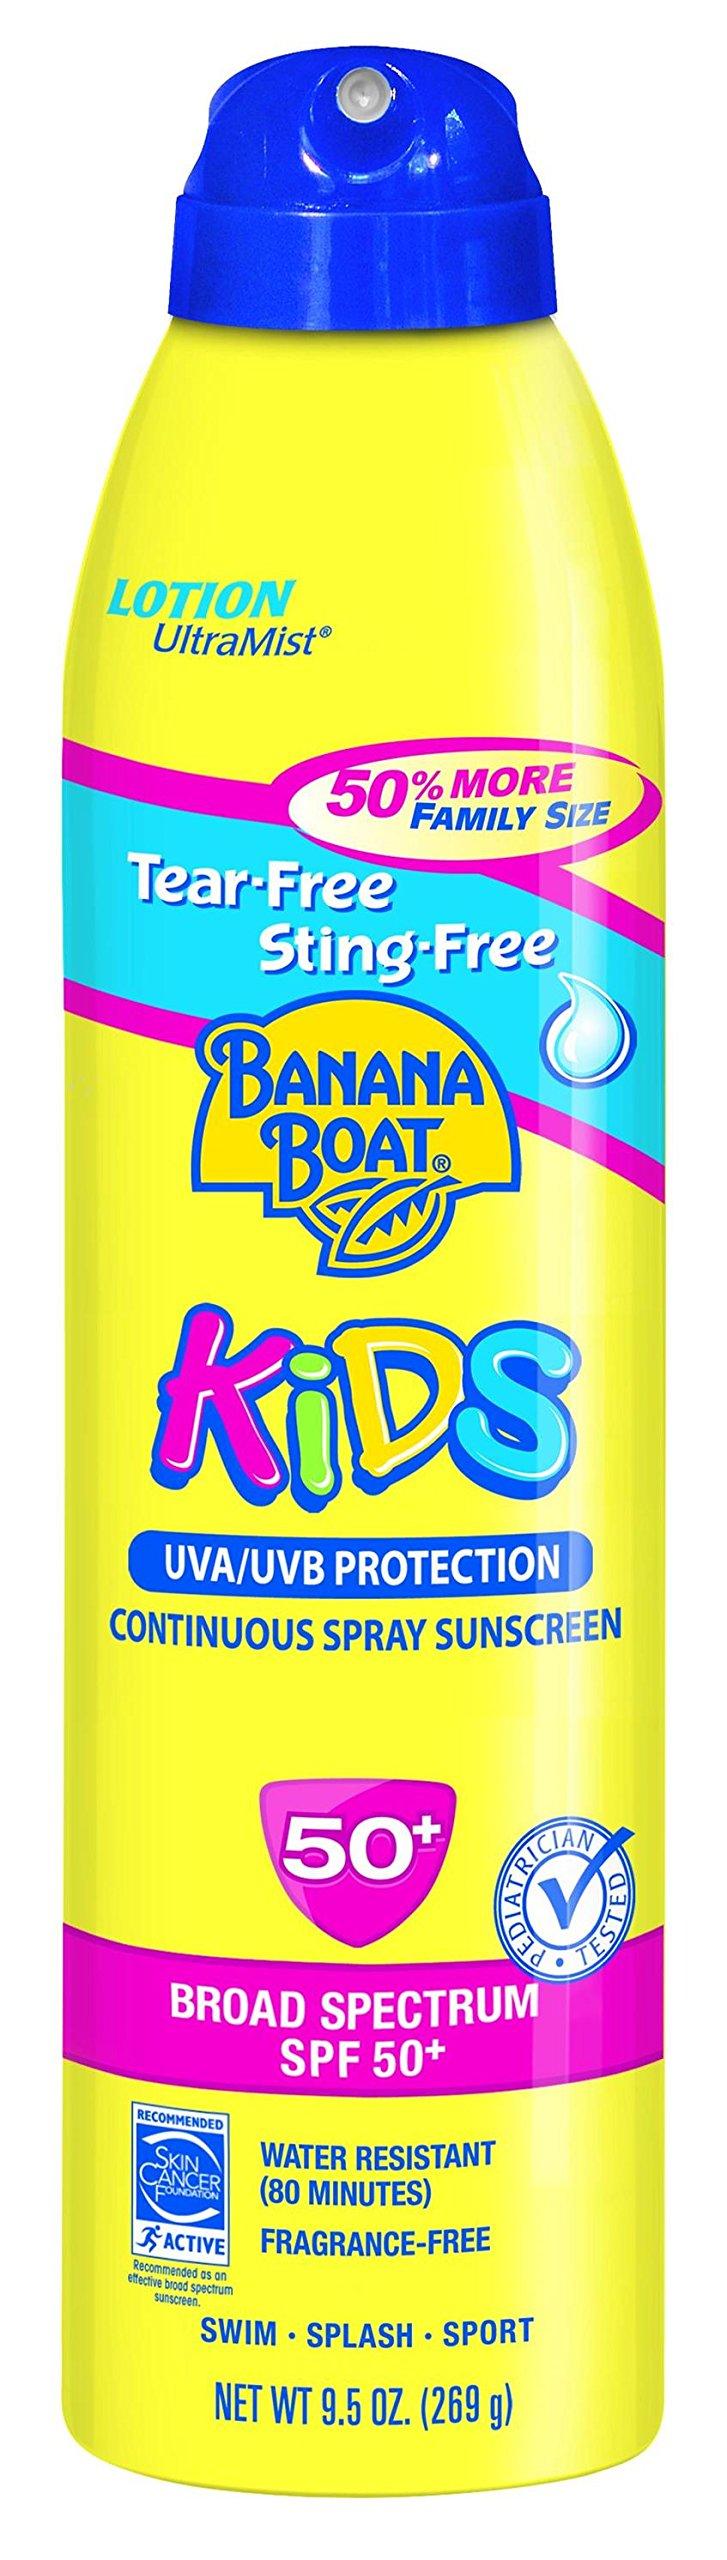 Banana Boat Sunscreen Ultra Mist Kids Tear-Free Sting-Free Broad Spectrum Sun Care Sunscreen Lotion - SPF 50, 9.5 Ounce